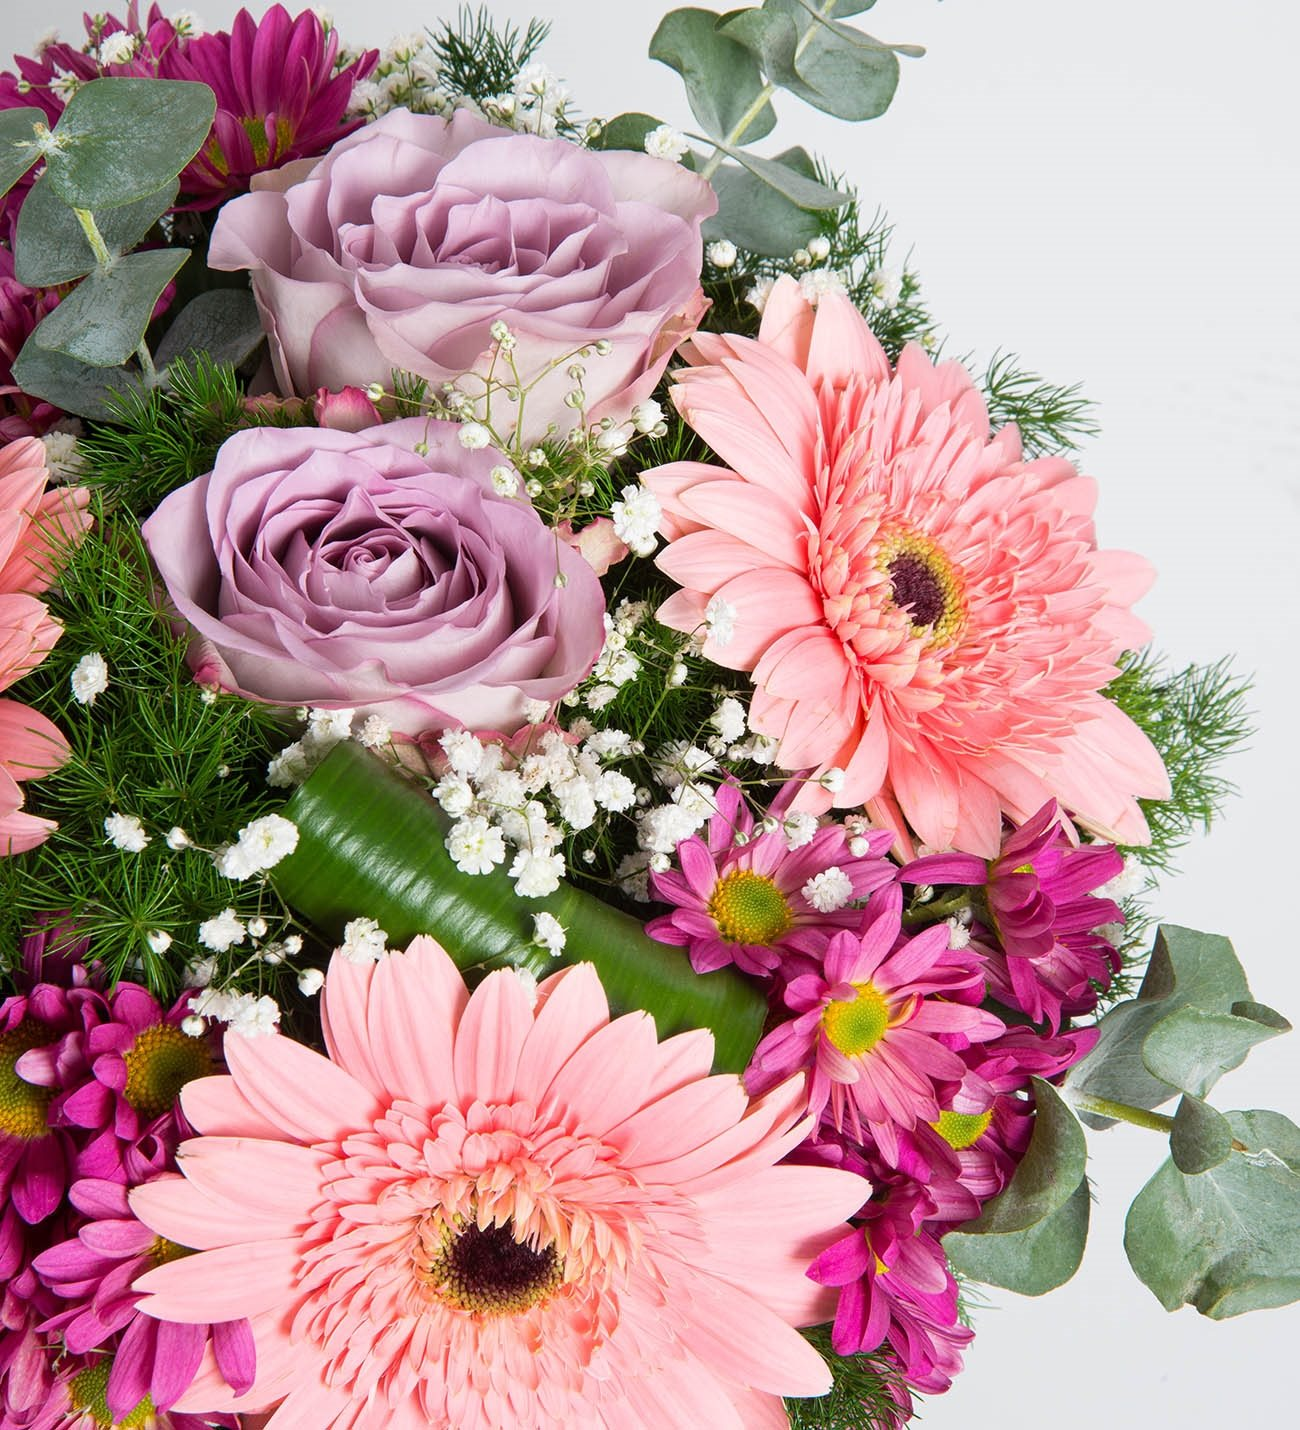 Roses and daisies warm colors gerberas roses and daisies warm colors izmirmasajfo Image collections